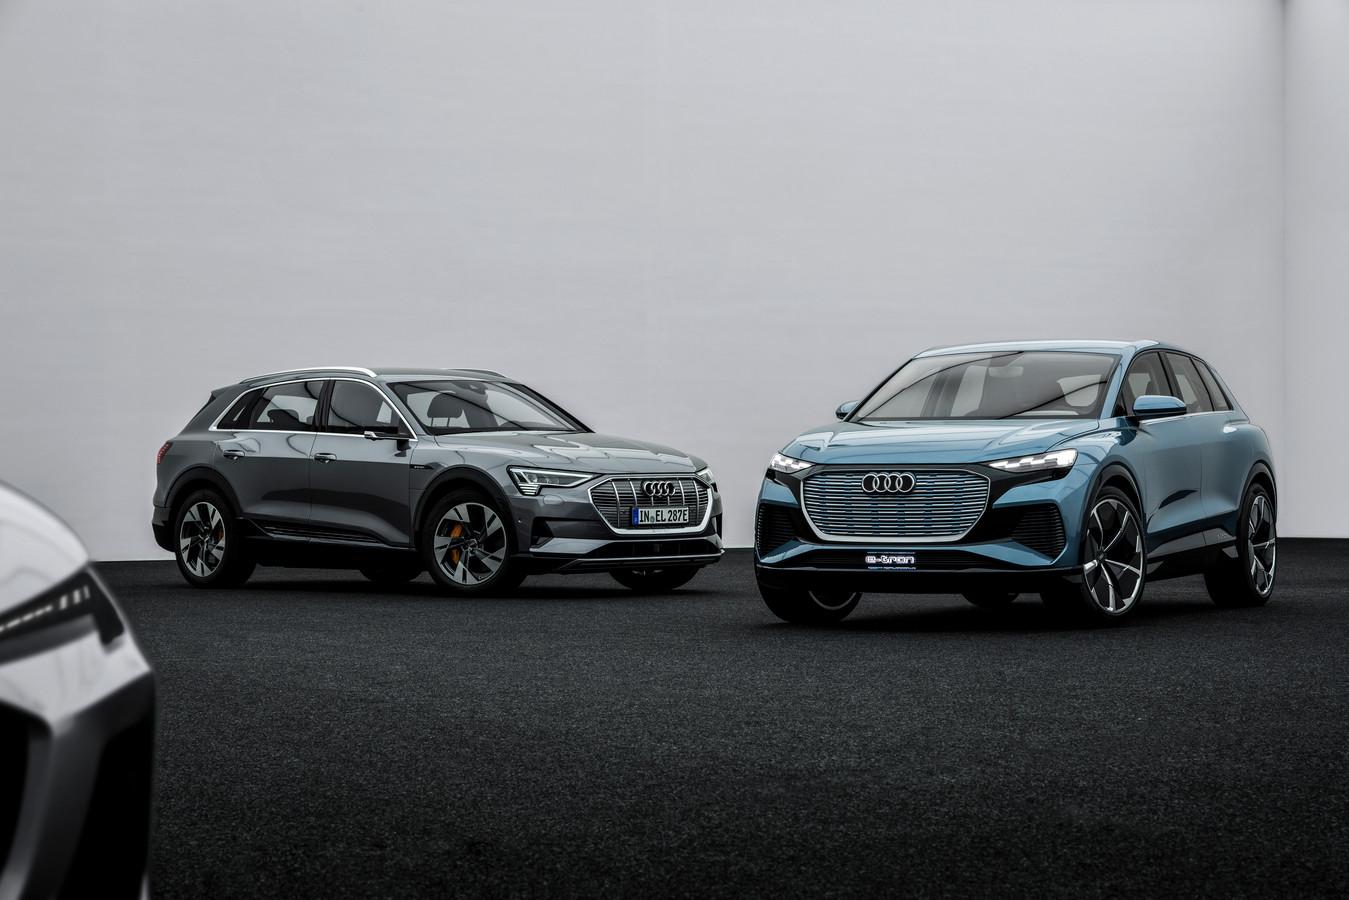 De Audi e-tron (links) en Q4 e-tron Concept naast elkaar